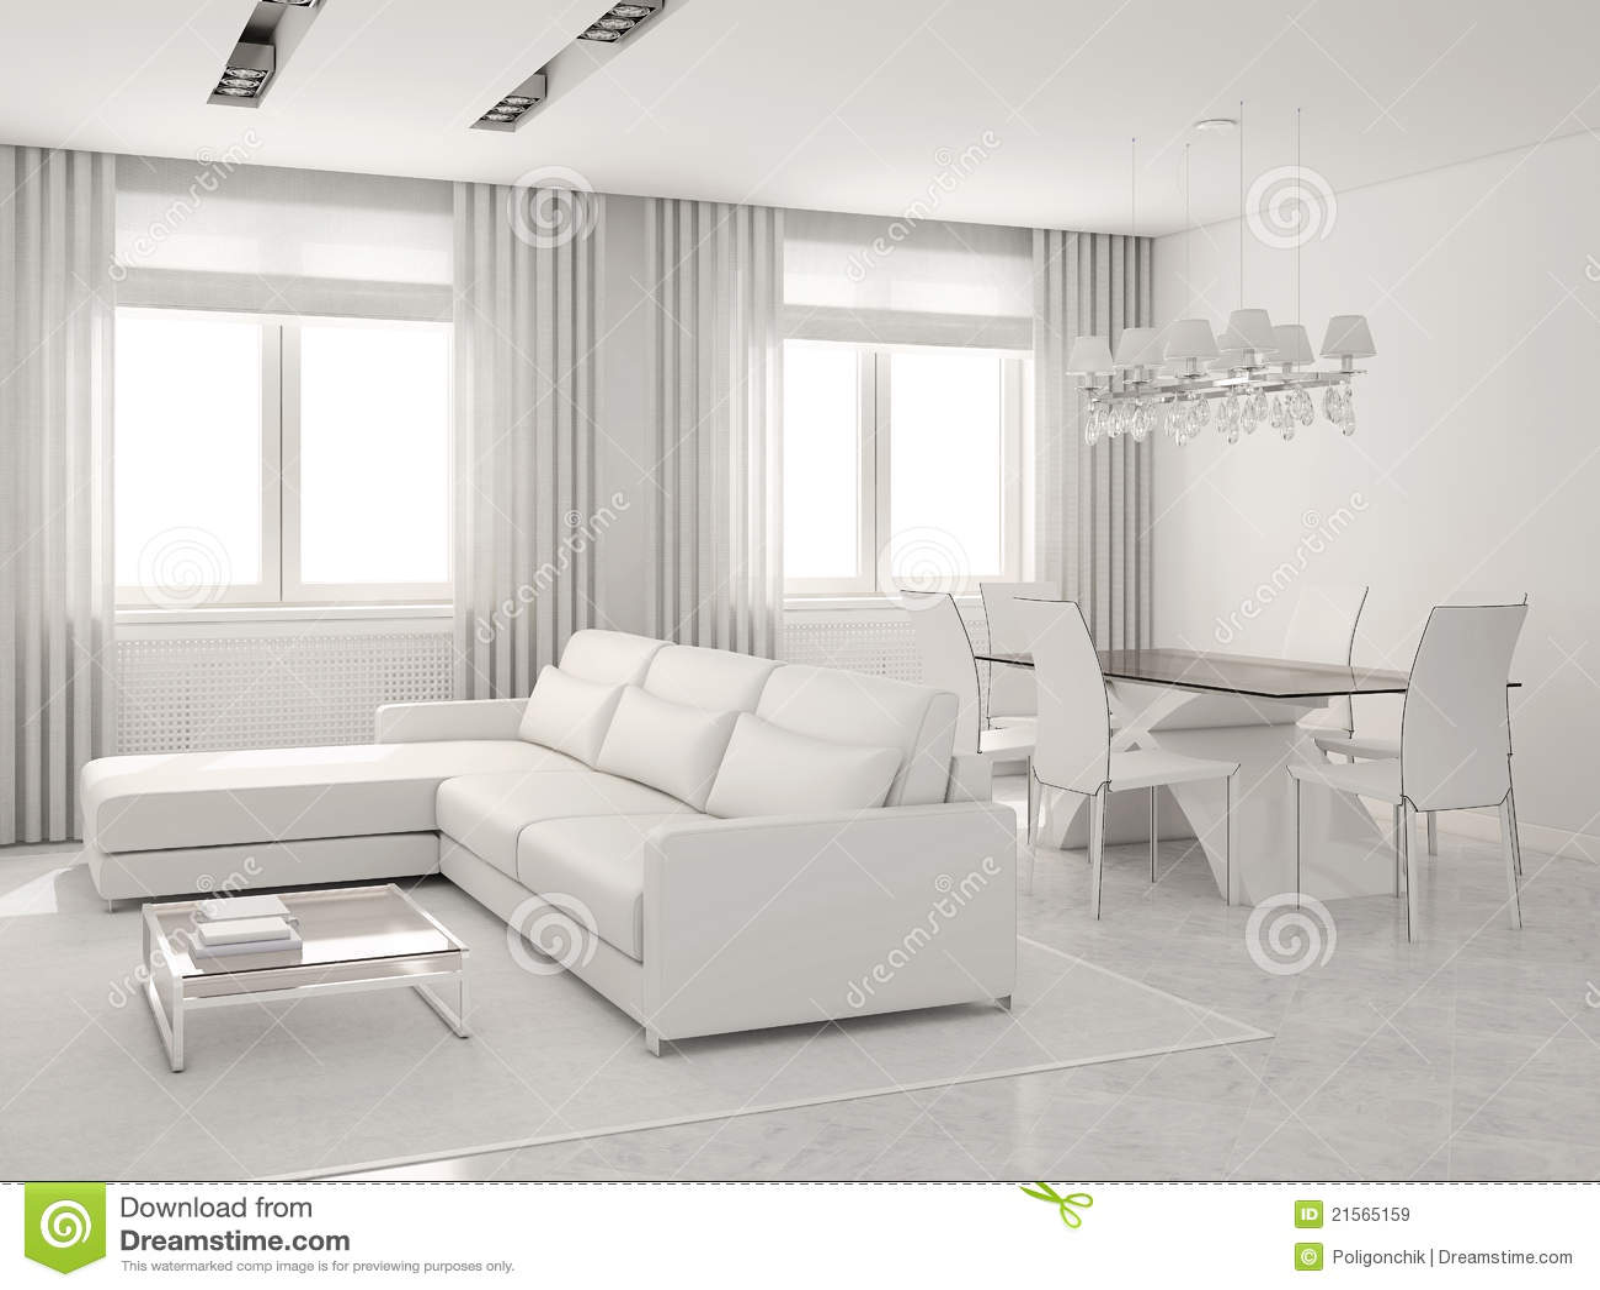 Sala Da Pranzo. Immagini Stock Libere Da Diritti Immagine: 21565159 #85A724 1300 1065 Quadro Per Sala Da Pranzo